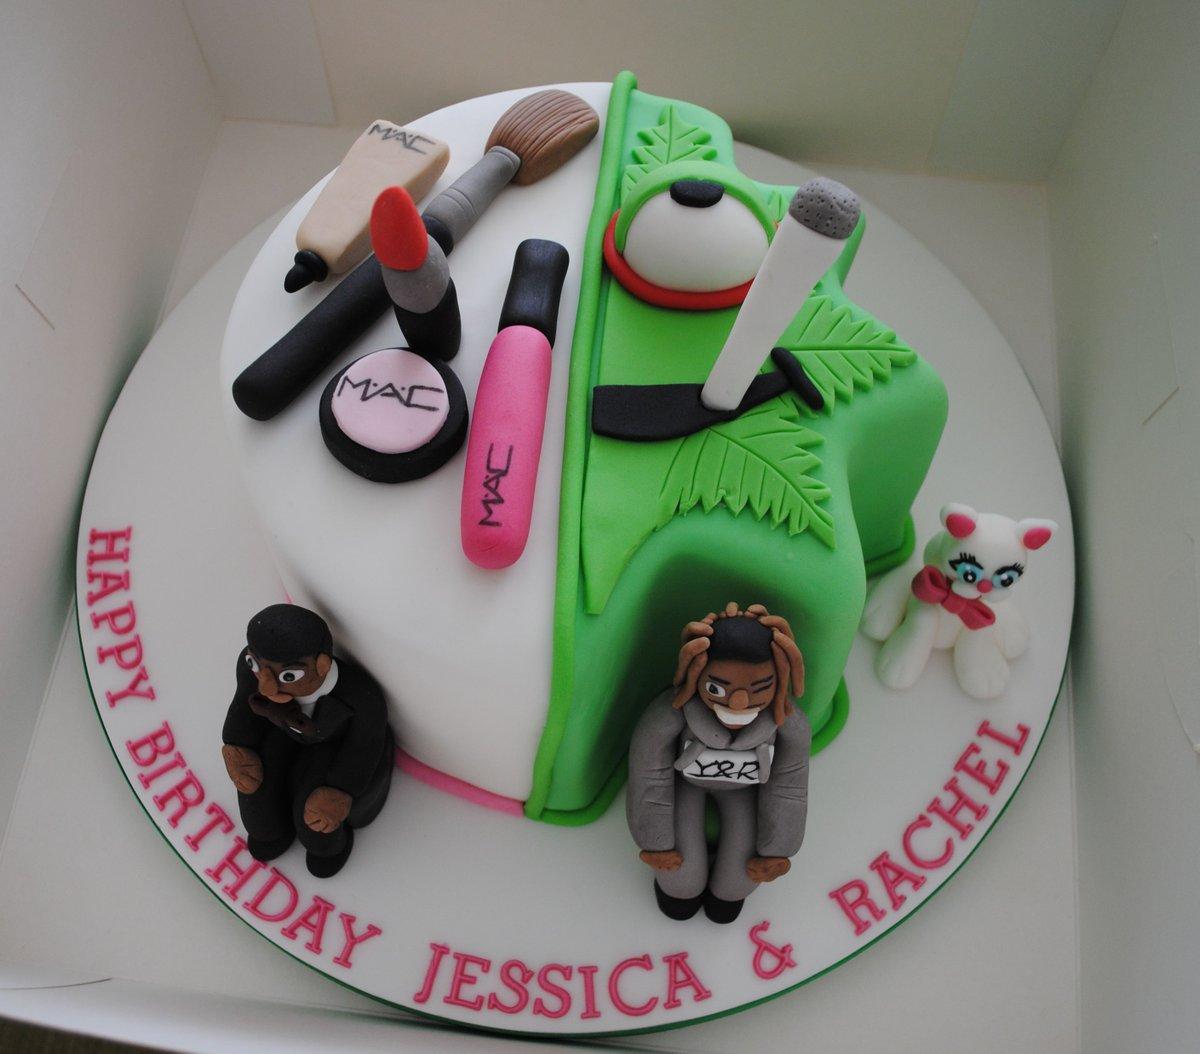 Miss Cupcakes On Twitter Half And Half Birthday Cake For Rachel